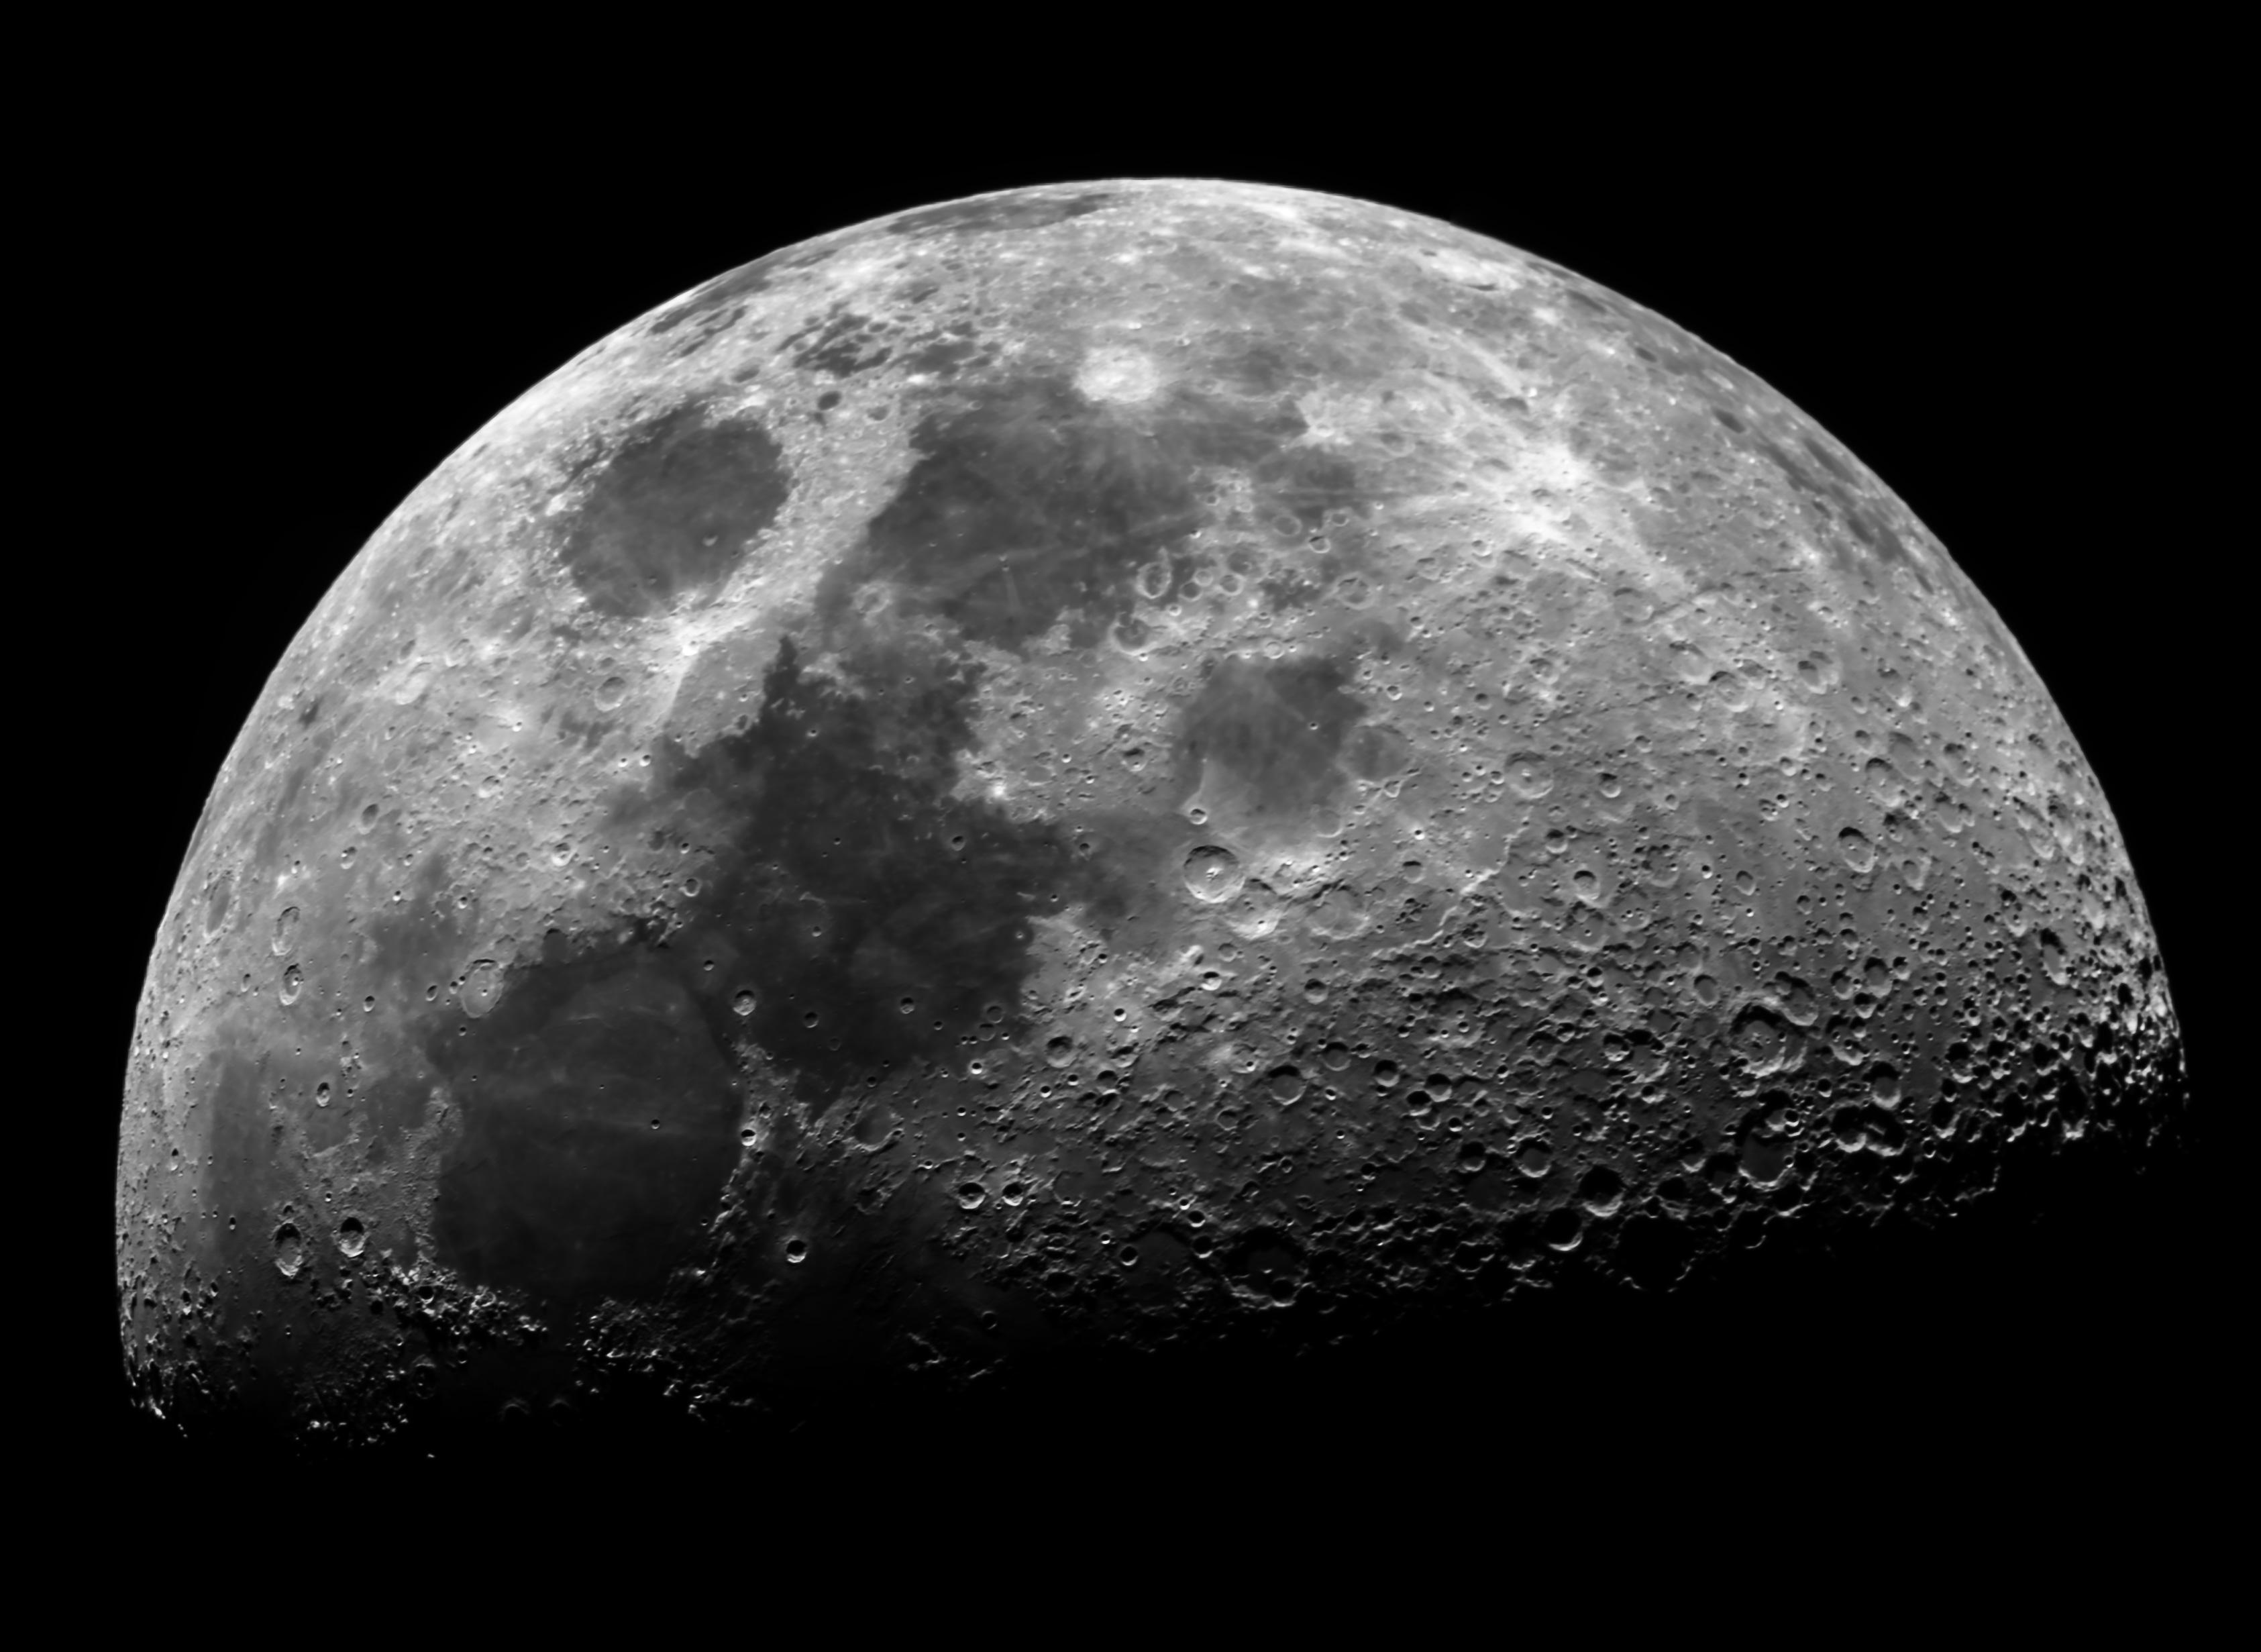 Moon 7.15d 55.9pc Mosaic 6 panes